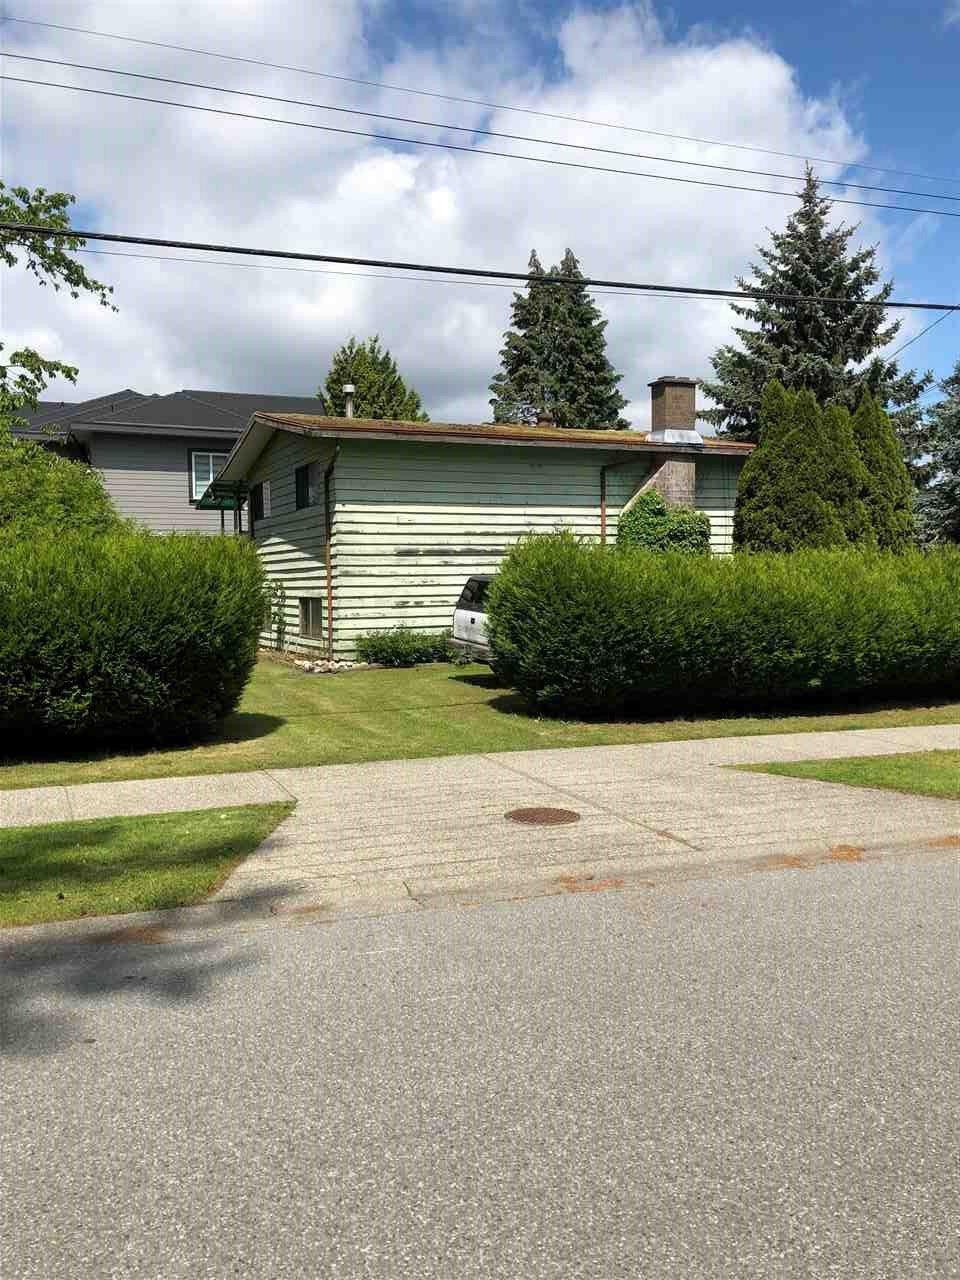 Main Photo: 8605 156TH Street in Surrey: Fleetwood Tynehead House for sale : MLS®# R2456744